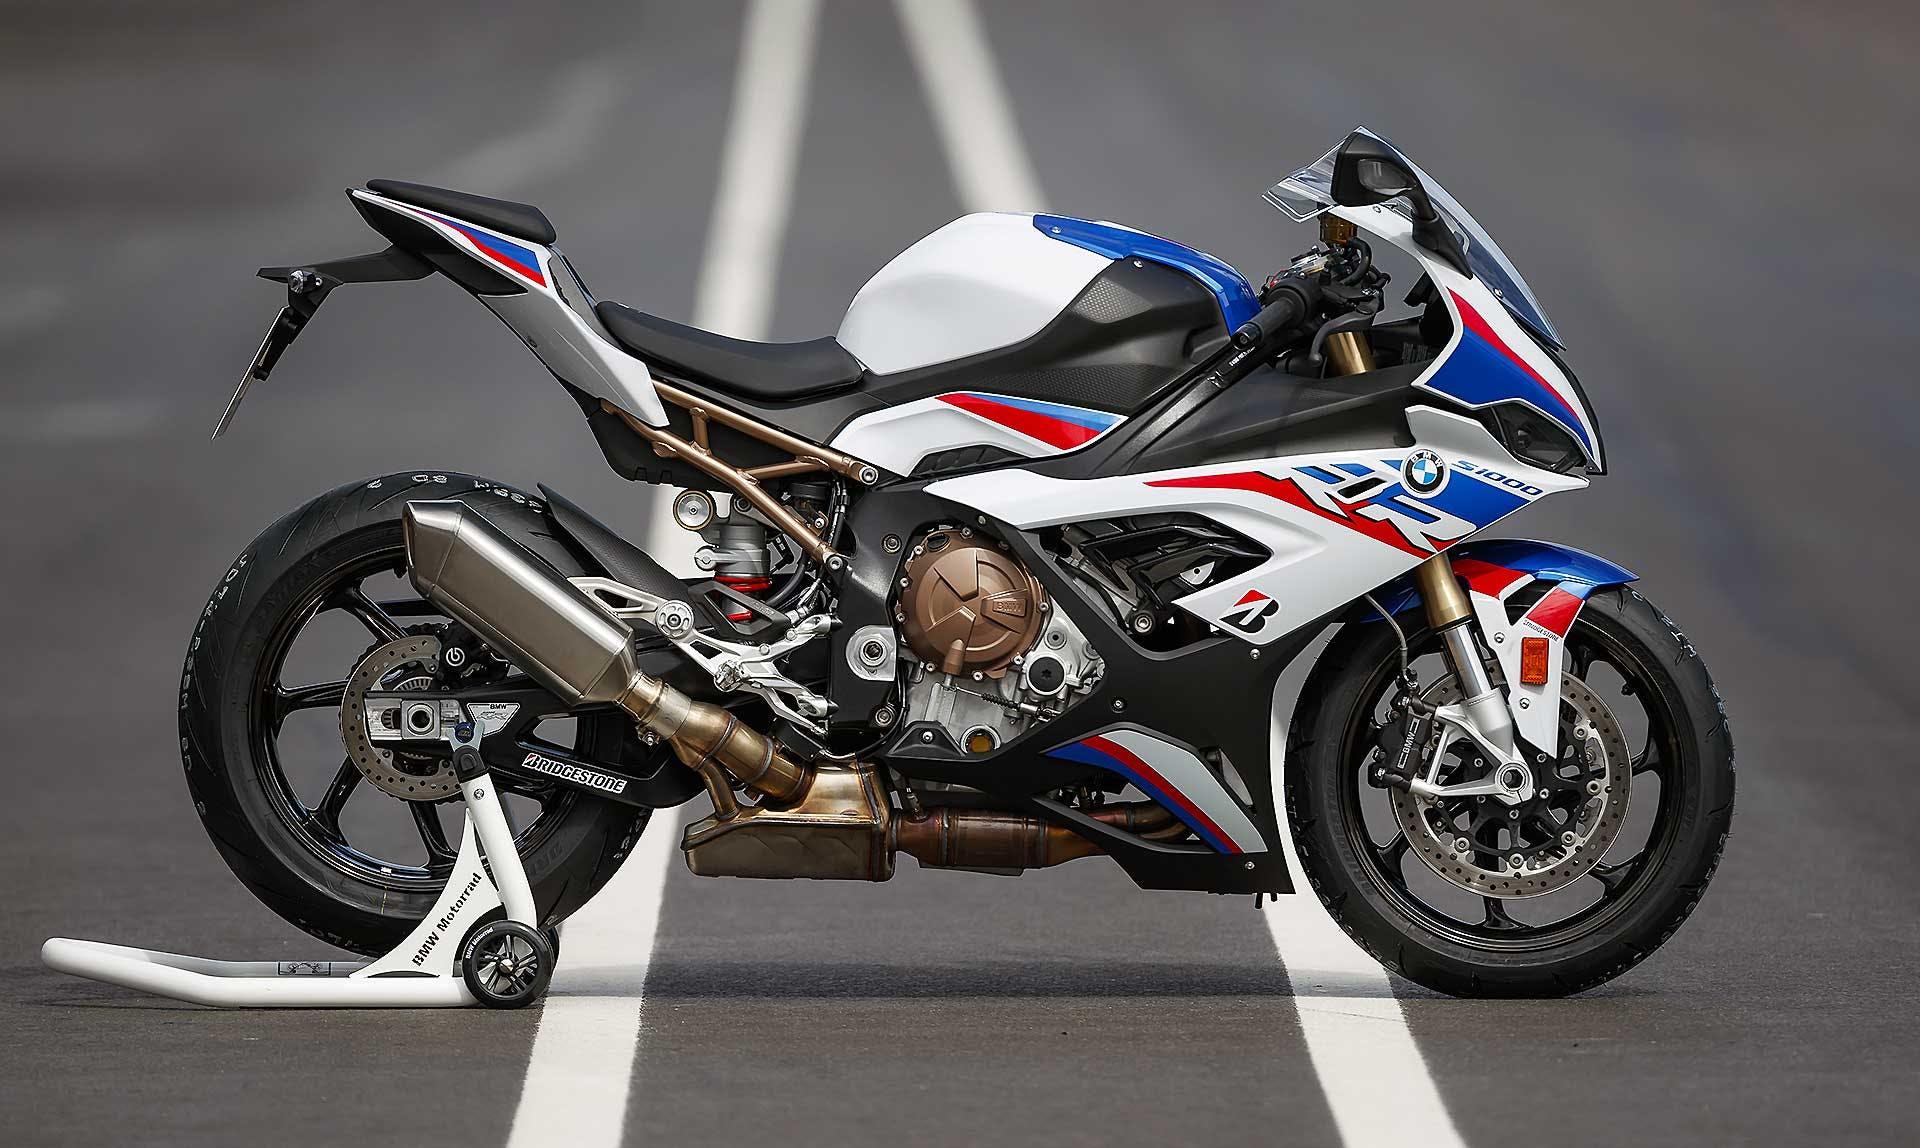 BMW-S1000RR-2019-001